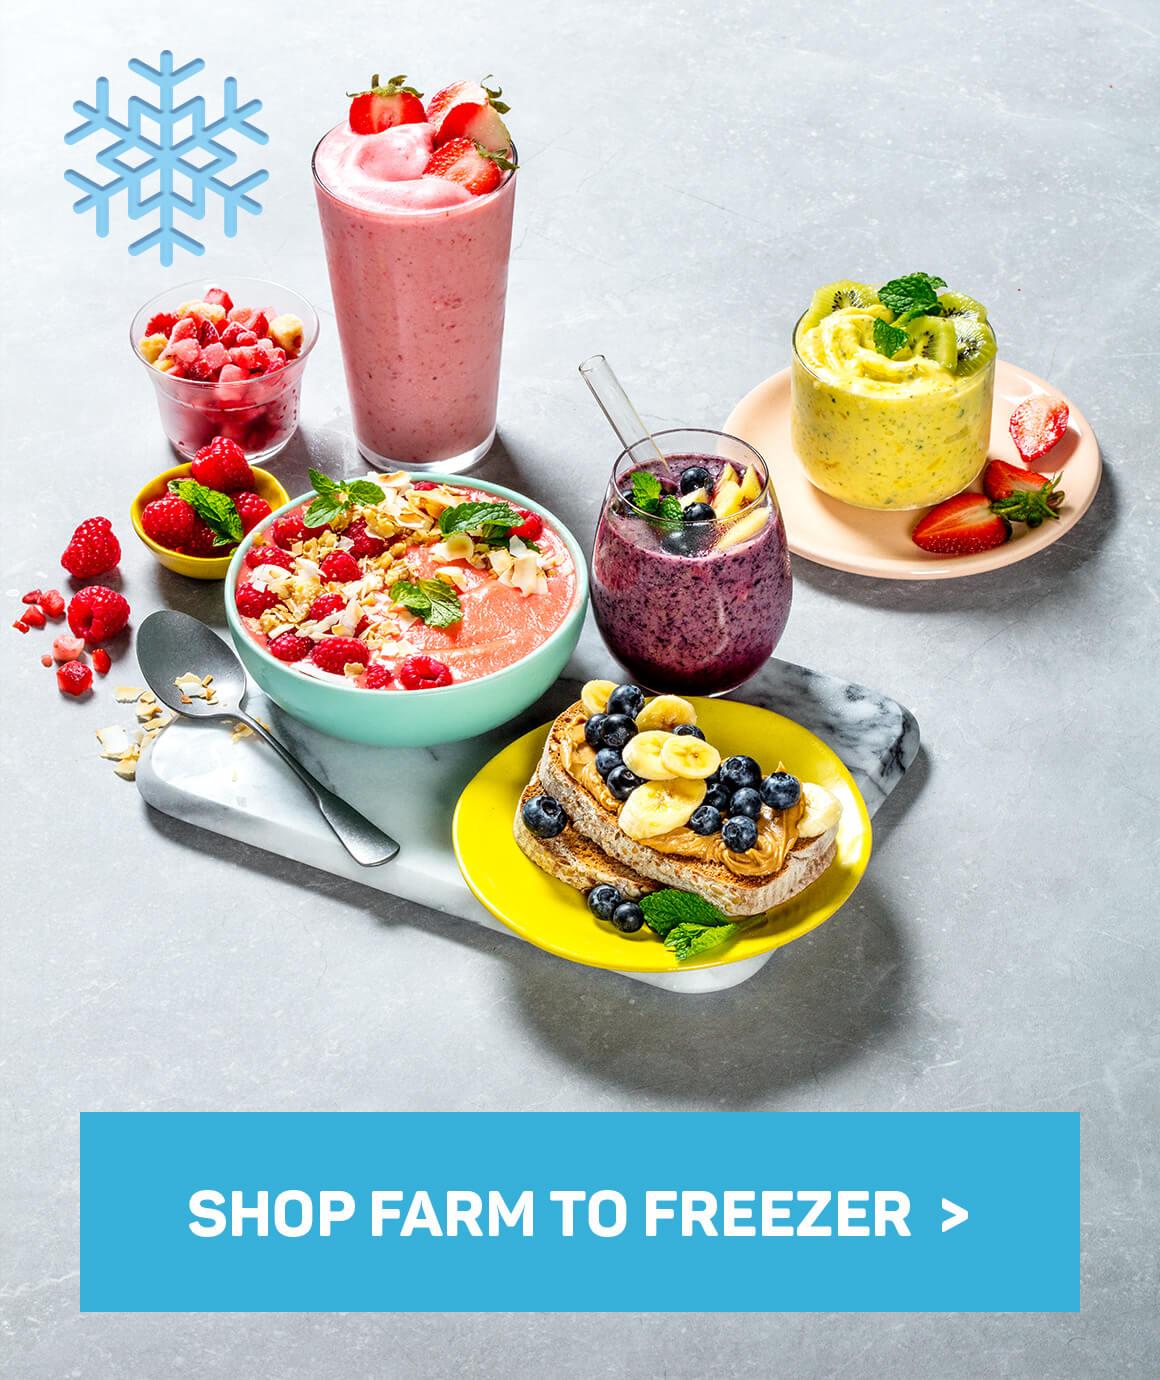 Shop farm to freezer